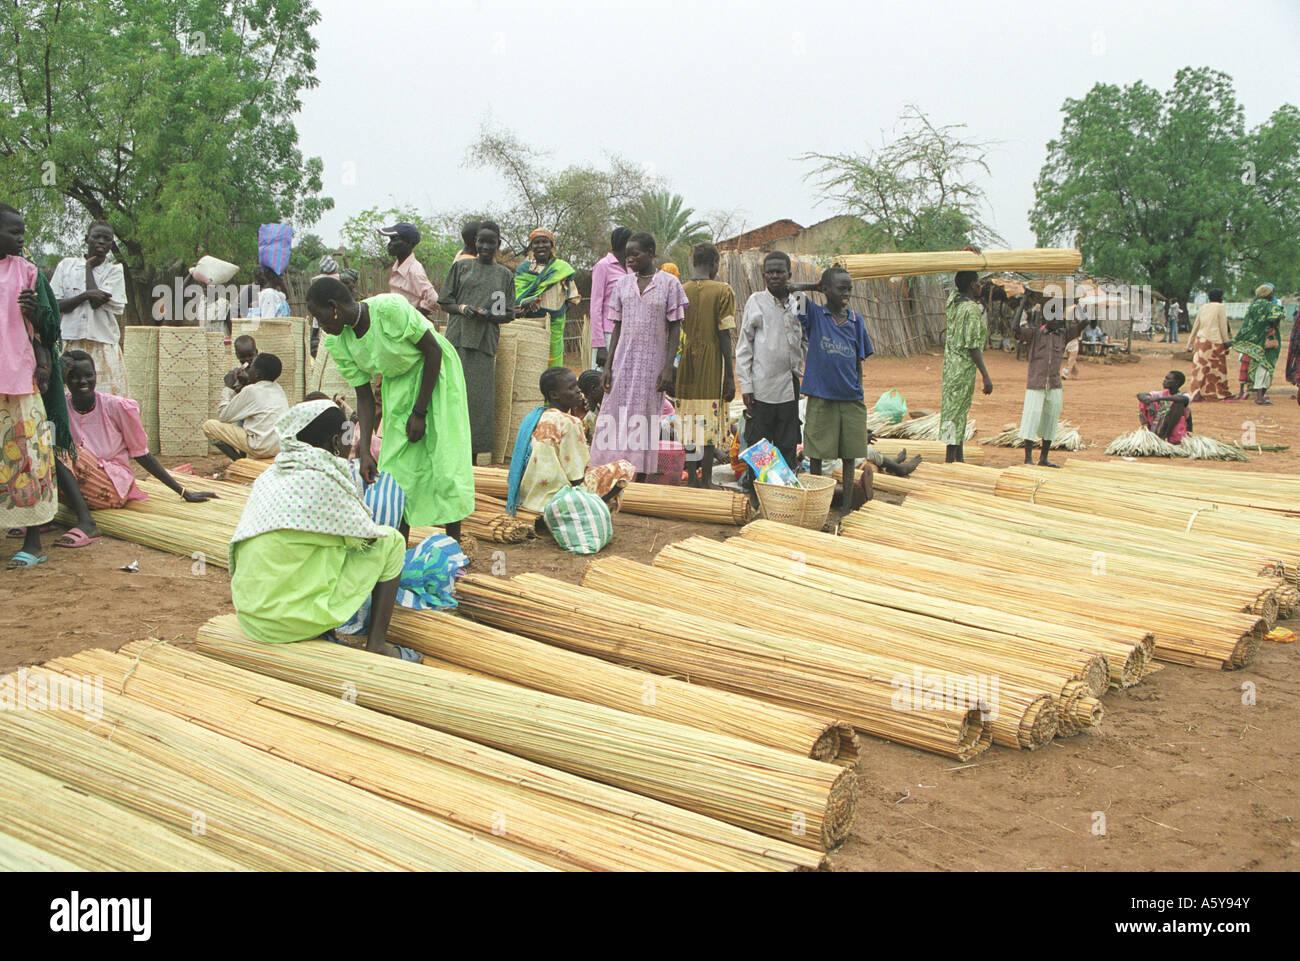 Women at Juba market, South Sudan - Stock Image